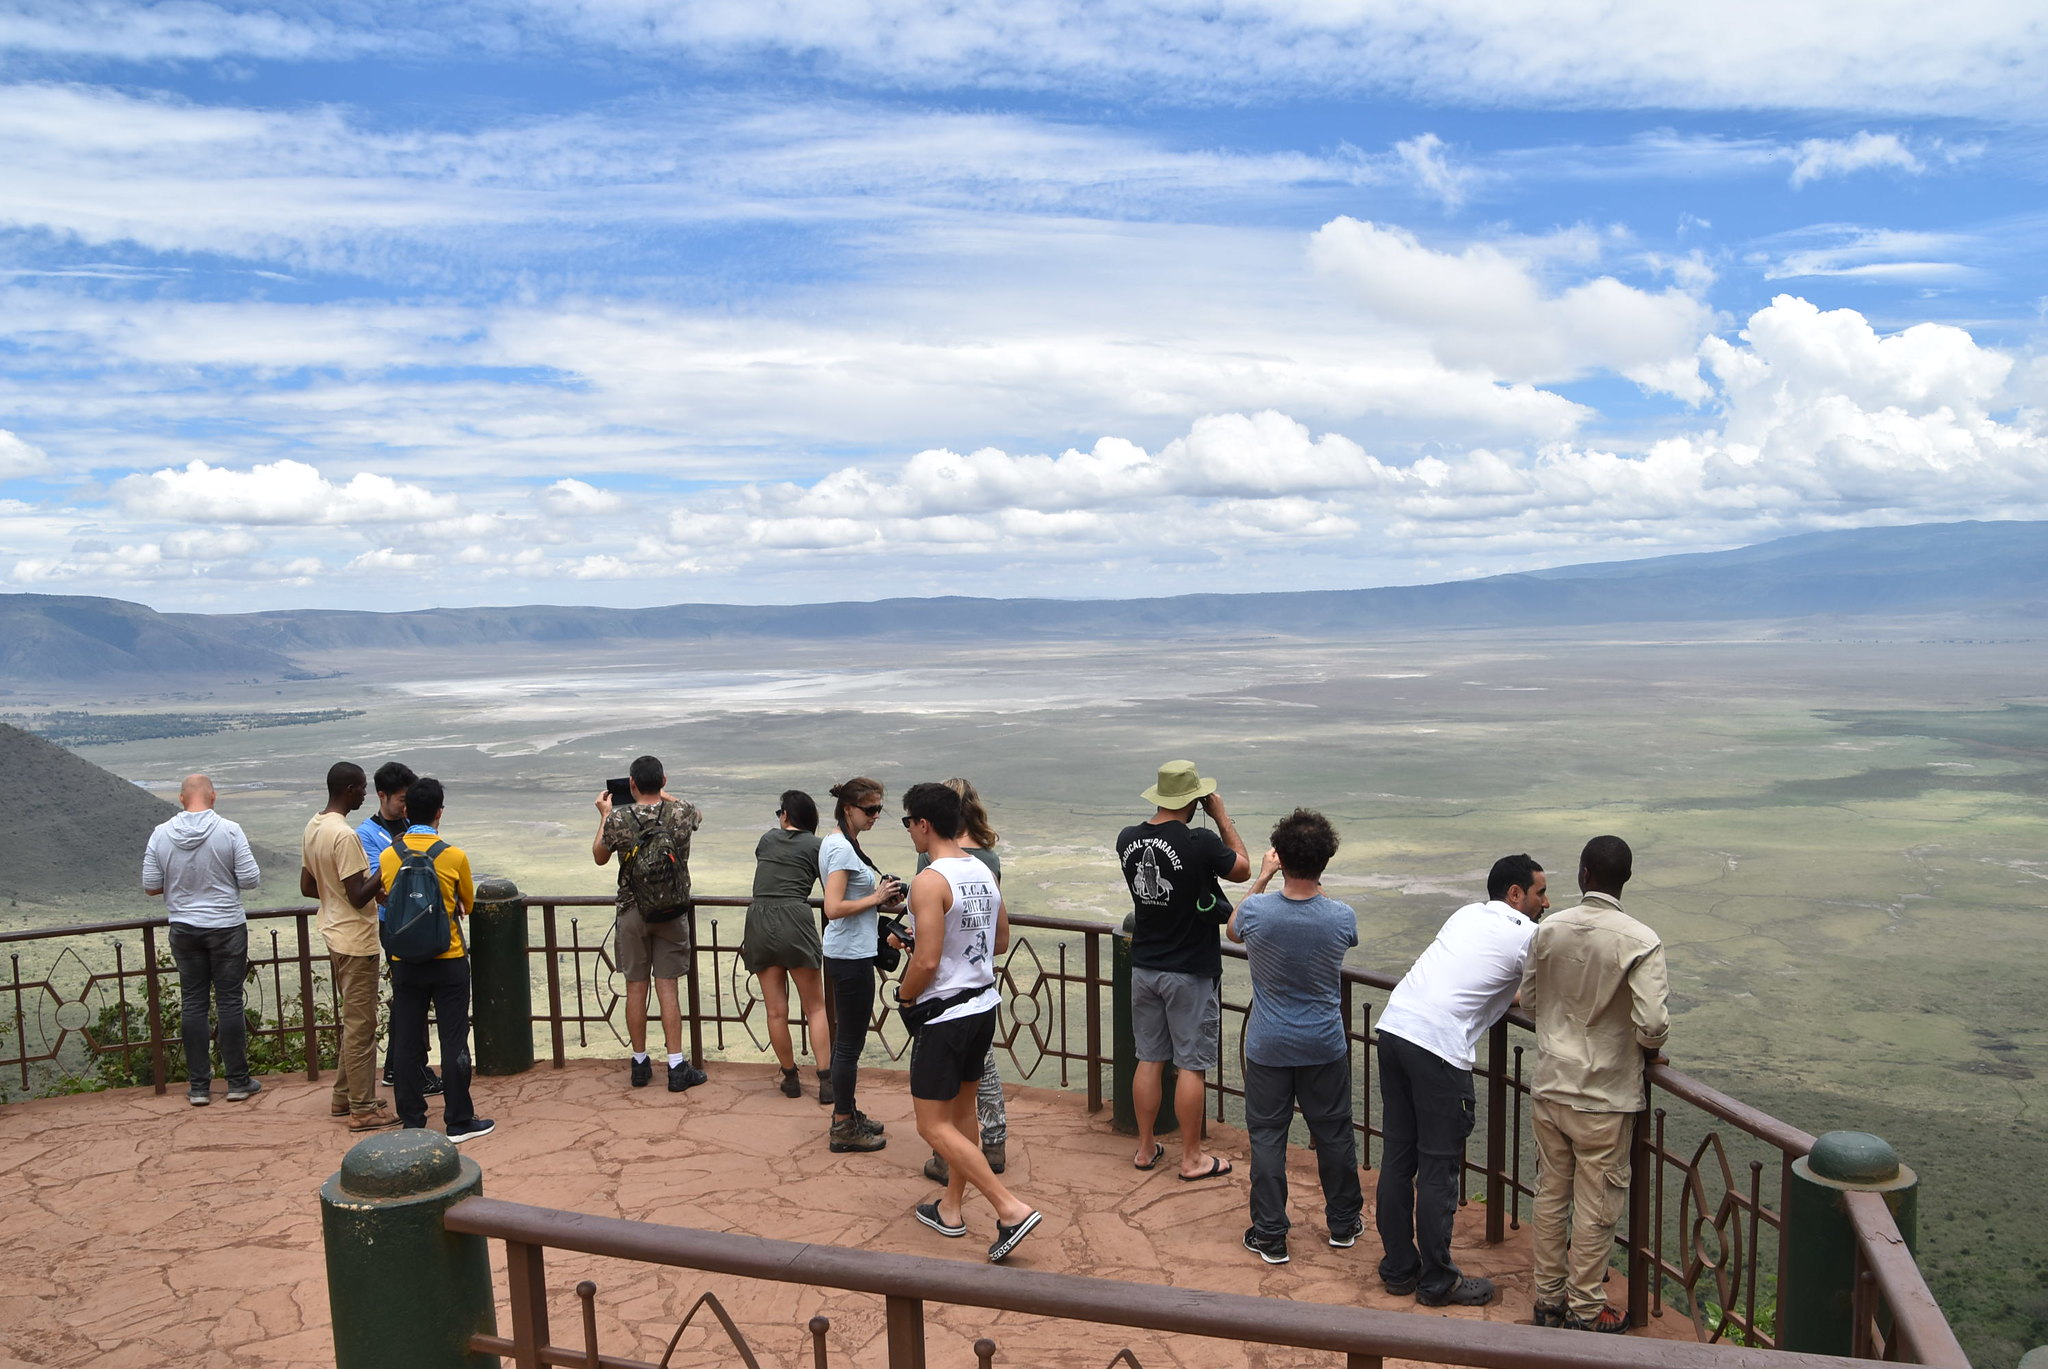 Covid-19: UNWTO predict 20-30% fall in International tourist arrivals for 2020 in latest report